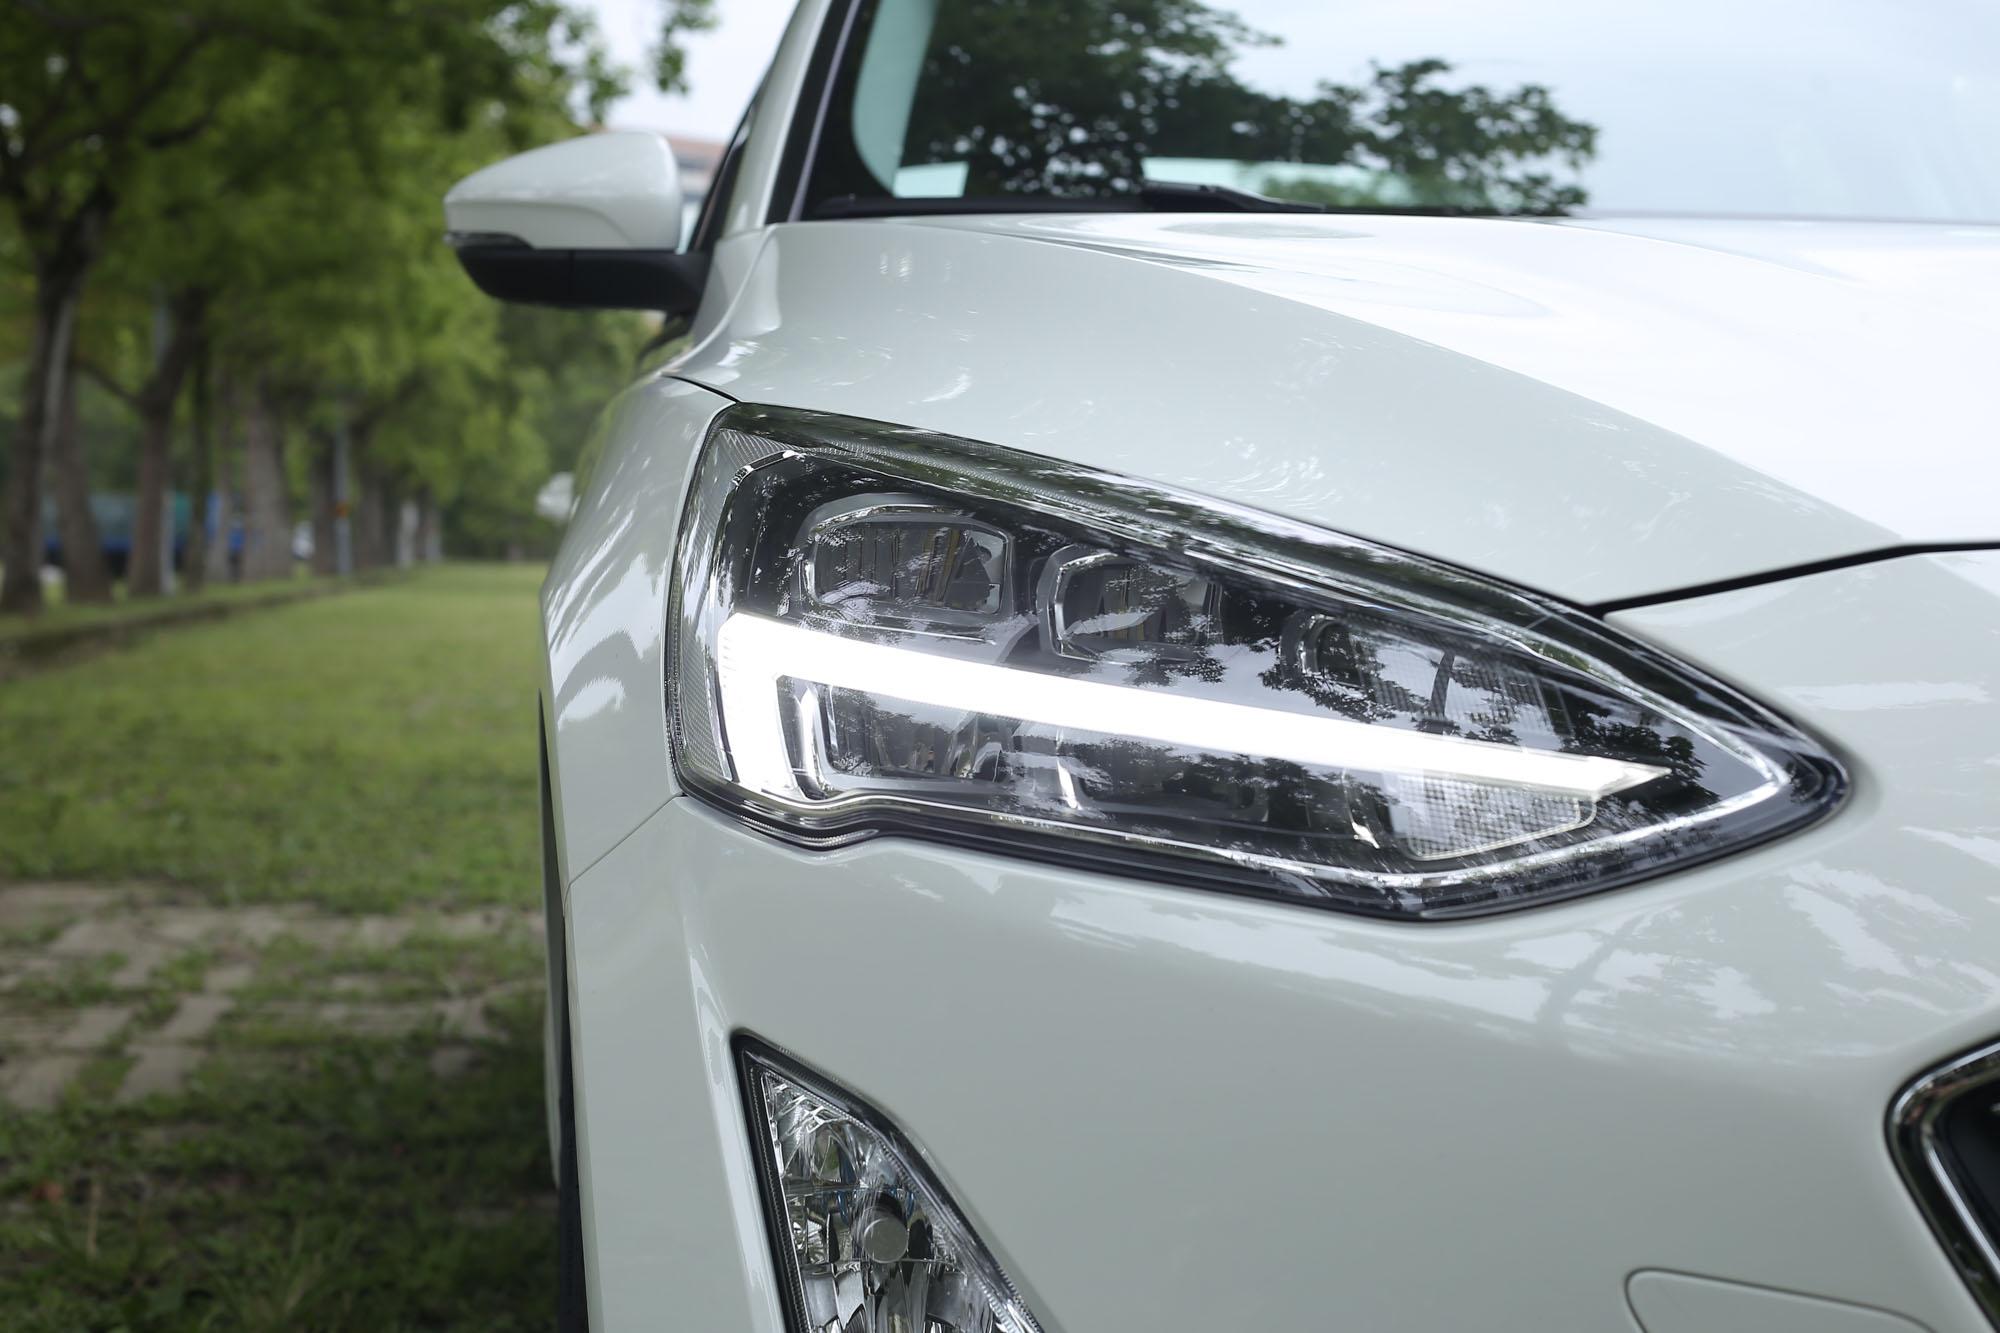 試駕的 EcoBoost 182 17TSR 四門車型配備 LED 頭燈,與五門頂規車型 ST-Line 版本相同。